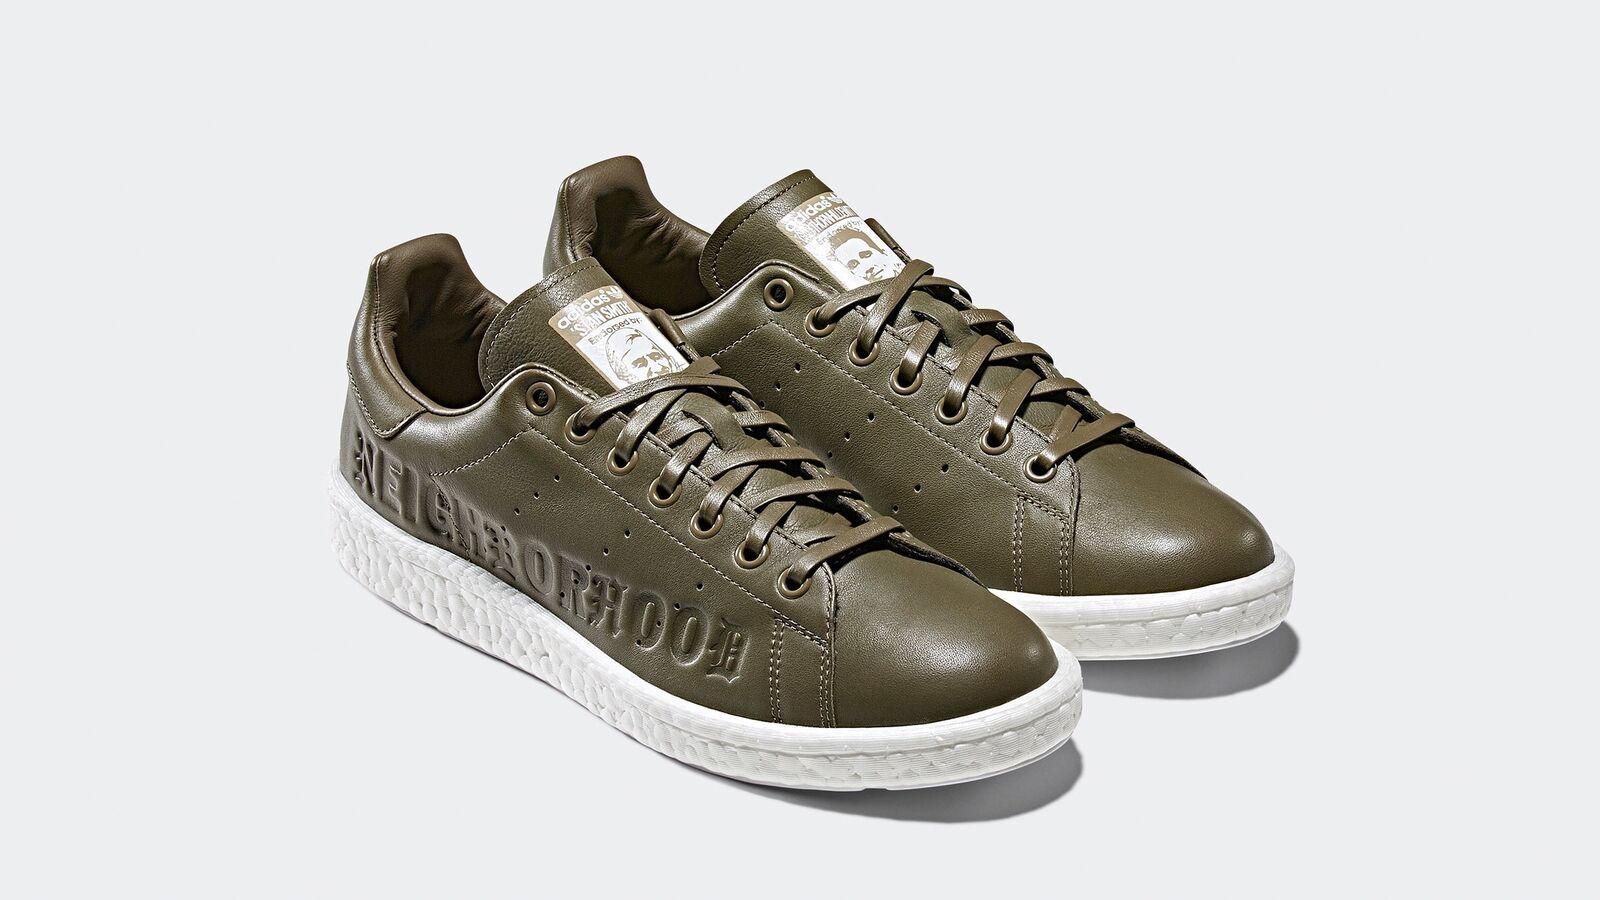 Adidas x NEIGHBORHOOD Stan Smith Boost Olive verde  B37342 Dimensione 9 US  comodamente